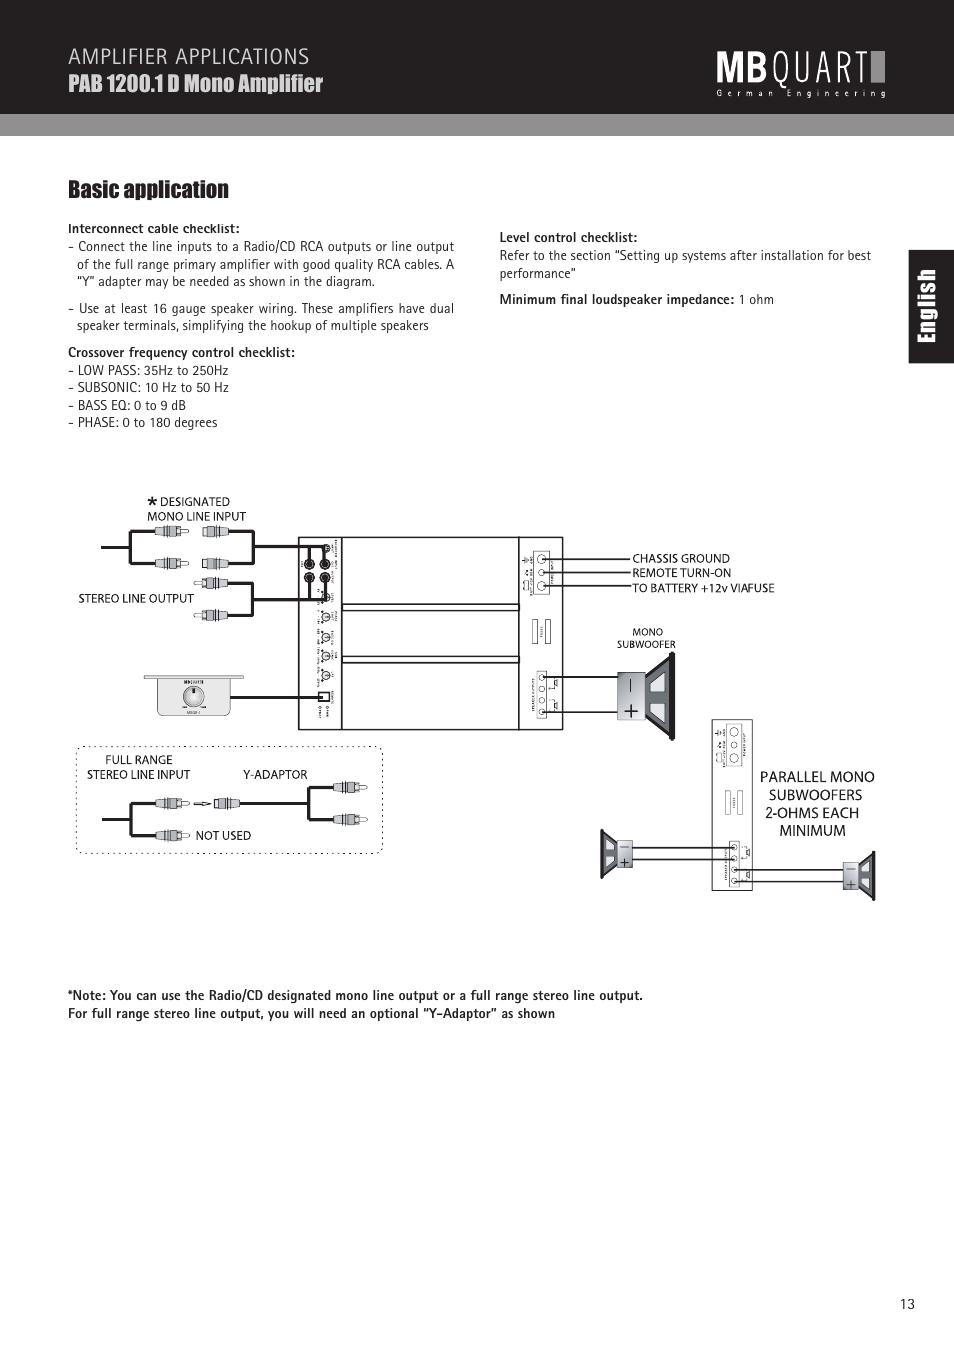 en gl is h basic application mb quart pab 1200 1 d user manual rh manualsdir com Quart MB Wiring- Diagrammcx160 mb quart crossover wiring